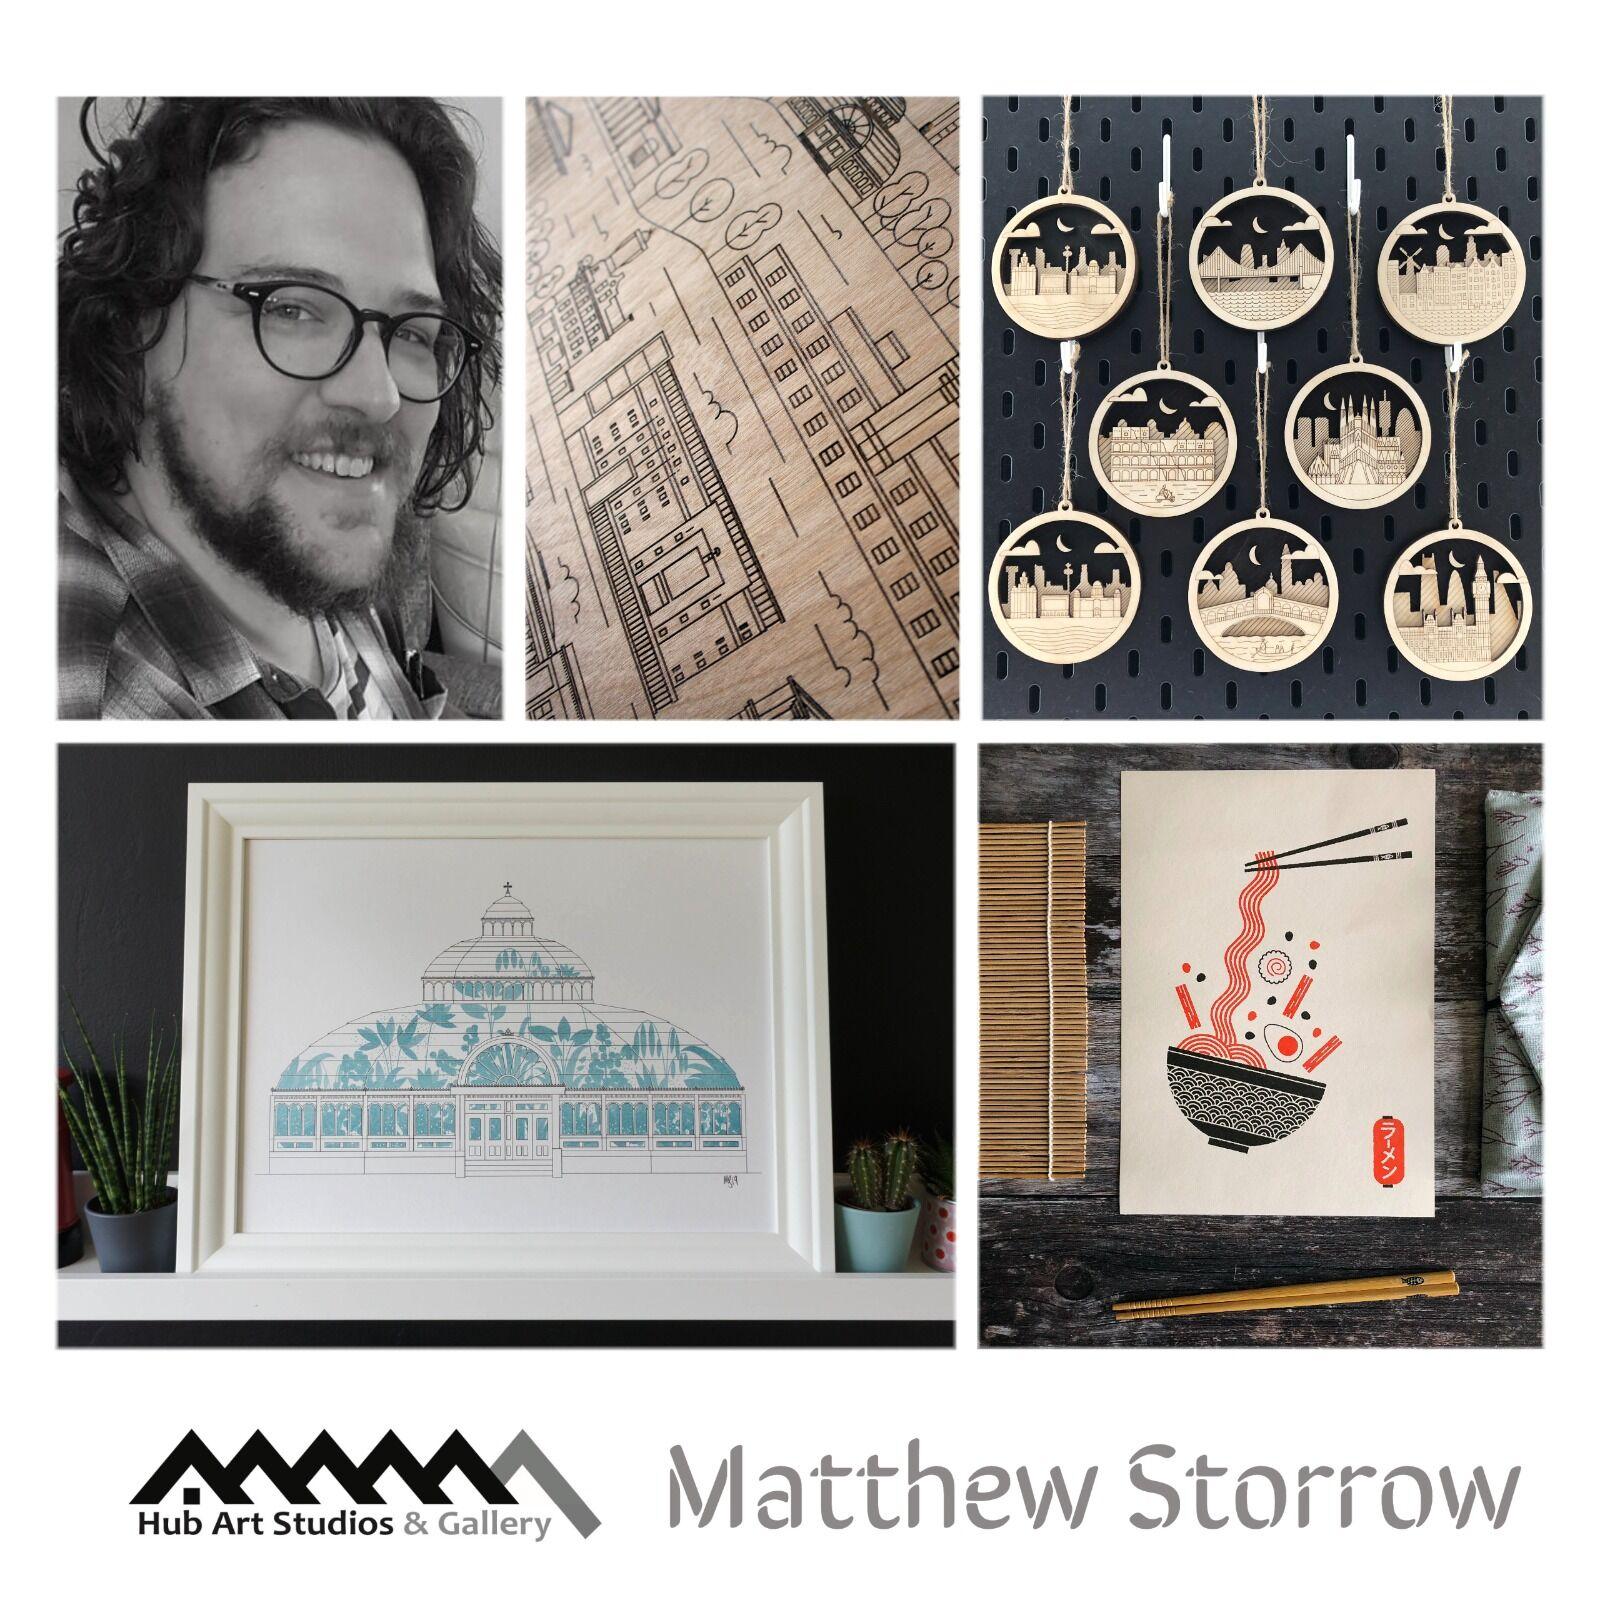 Matthew Storrow